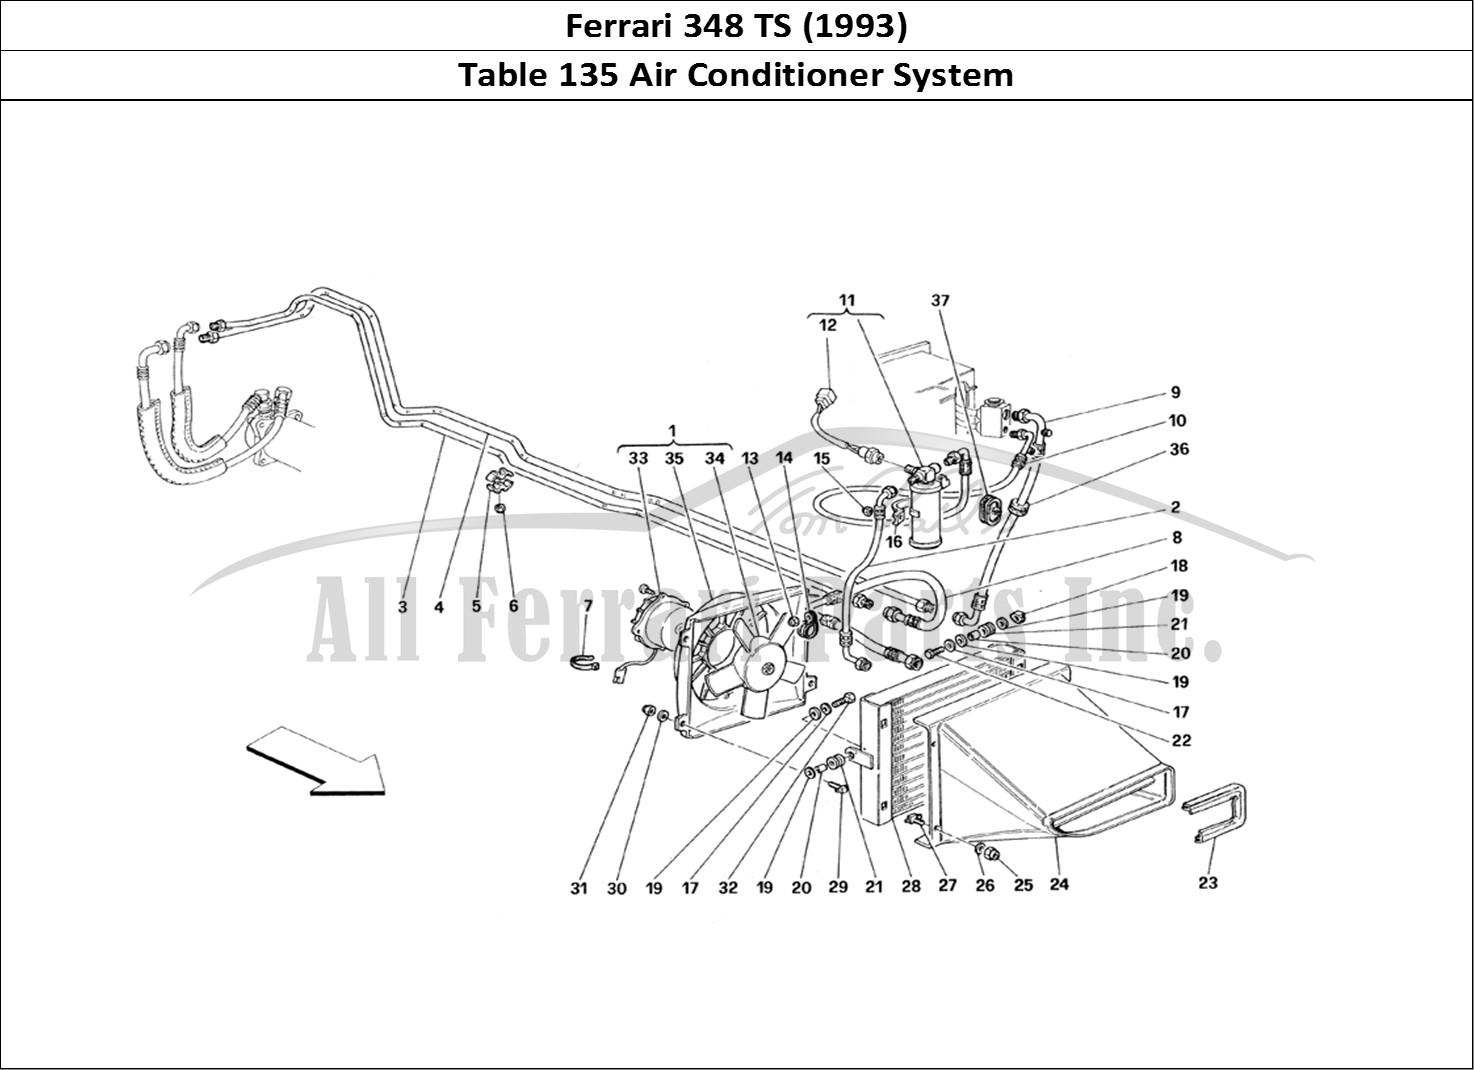 Buy original Ferrari 348 TS (1993) 135 Air Conditioner